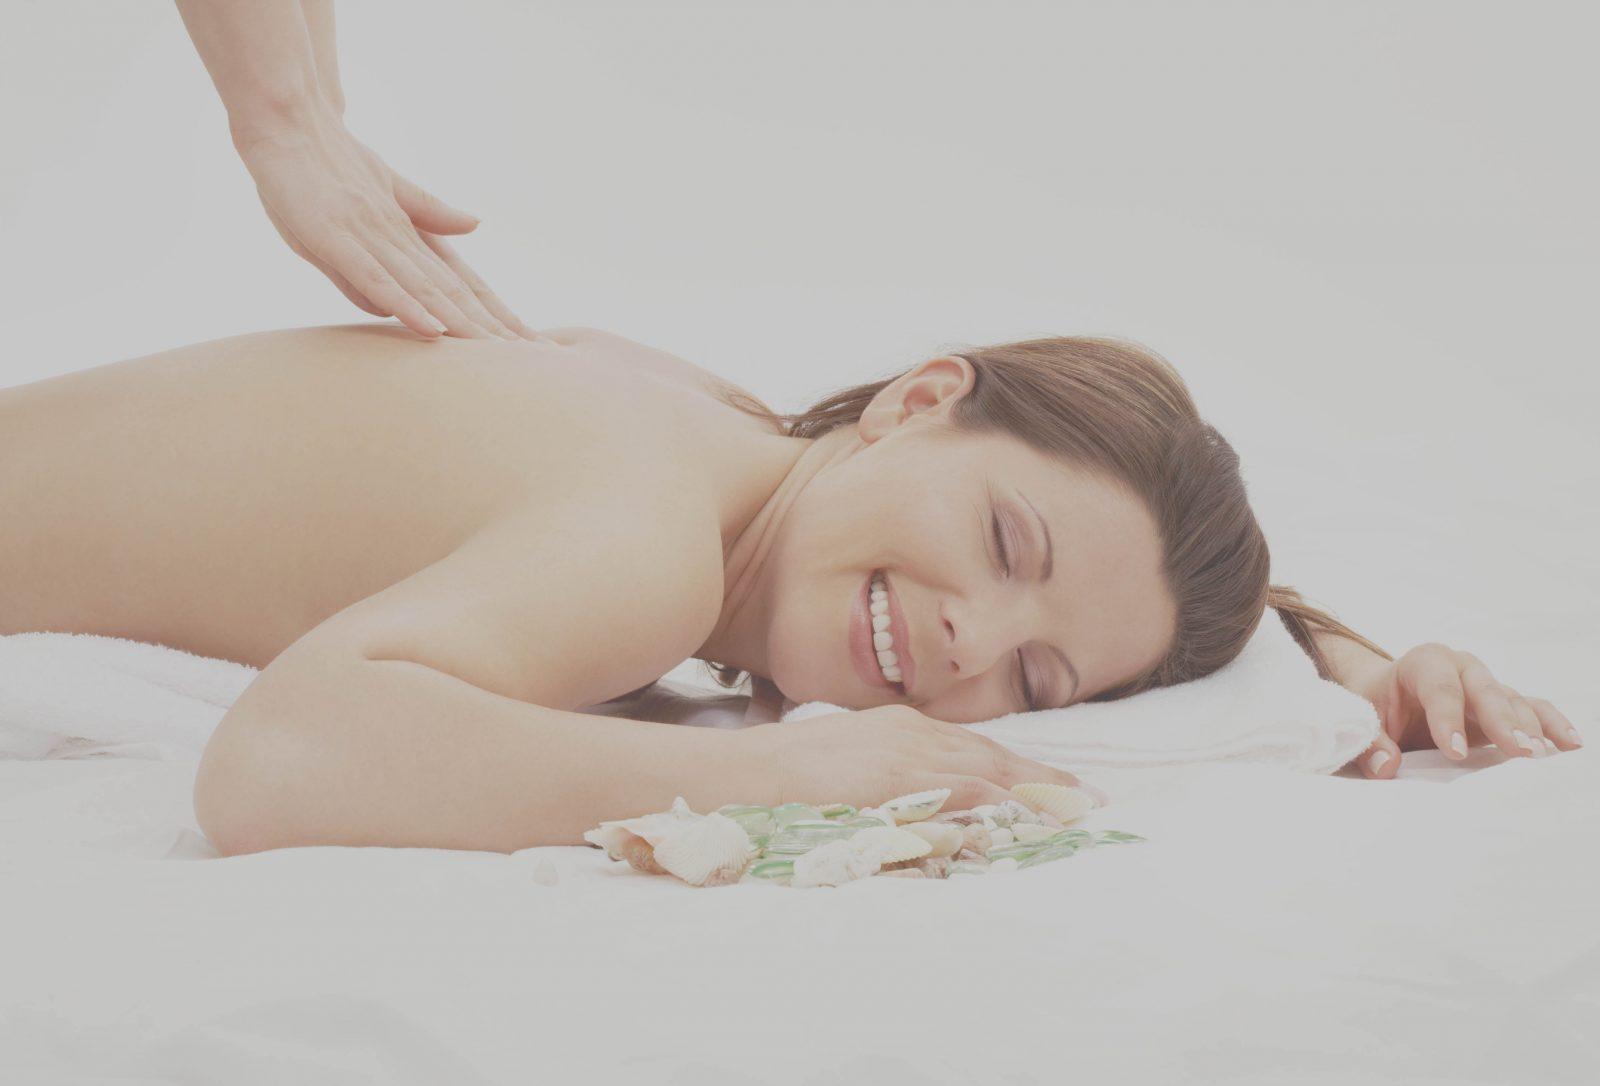 Wemoon massage candle make a sensual lubricant